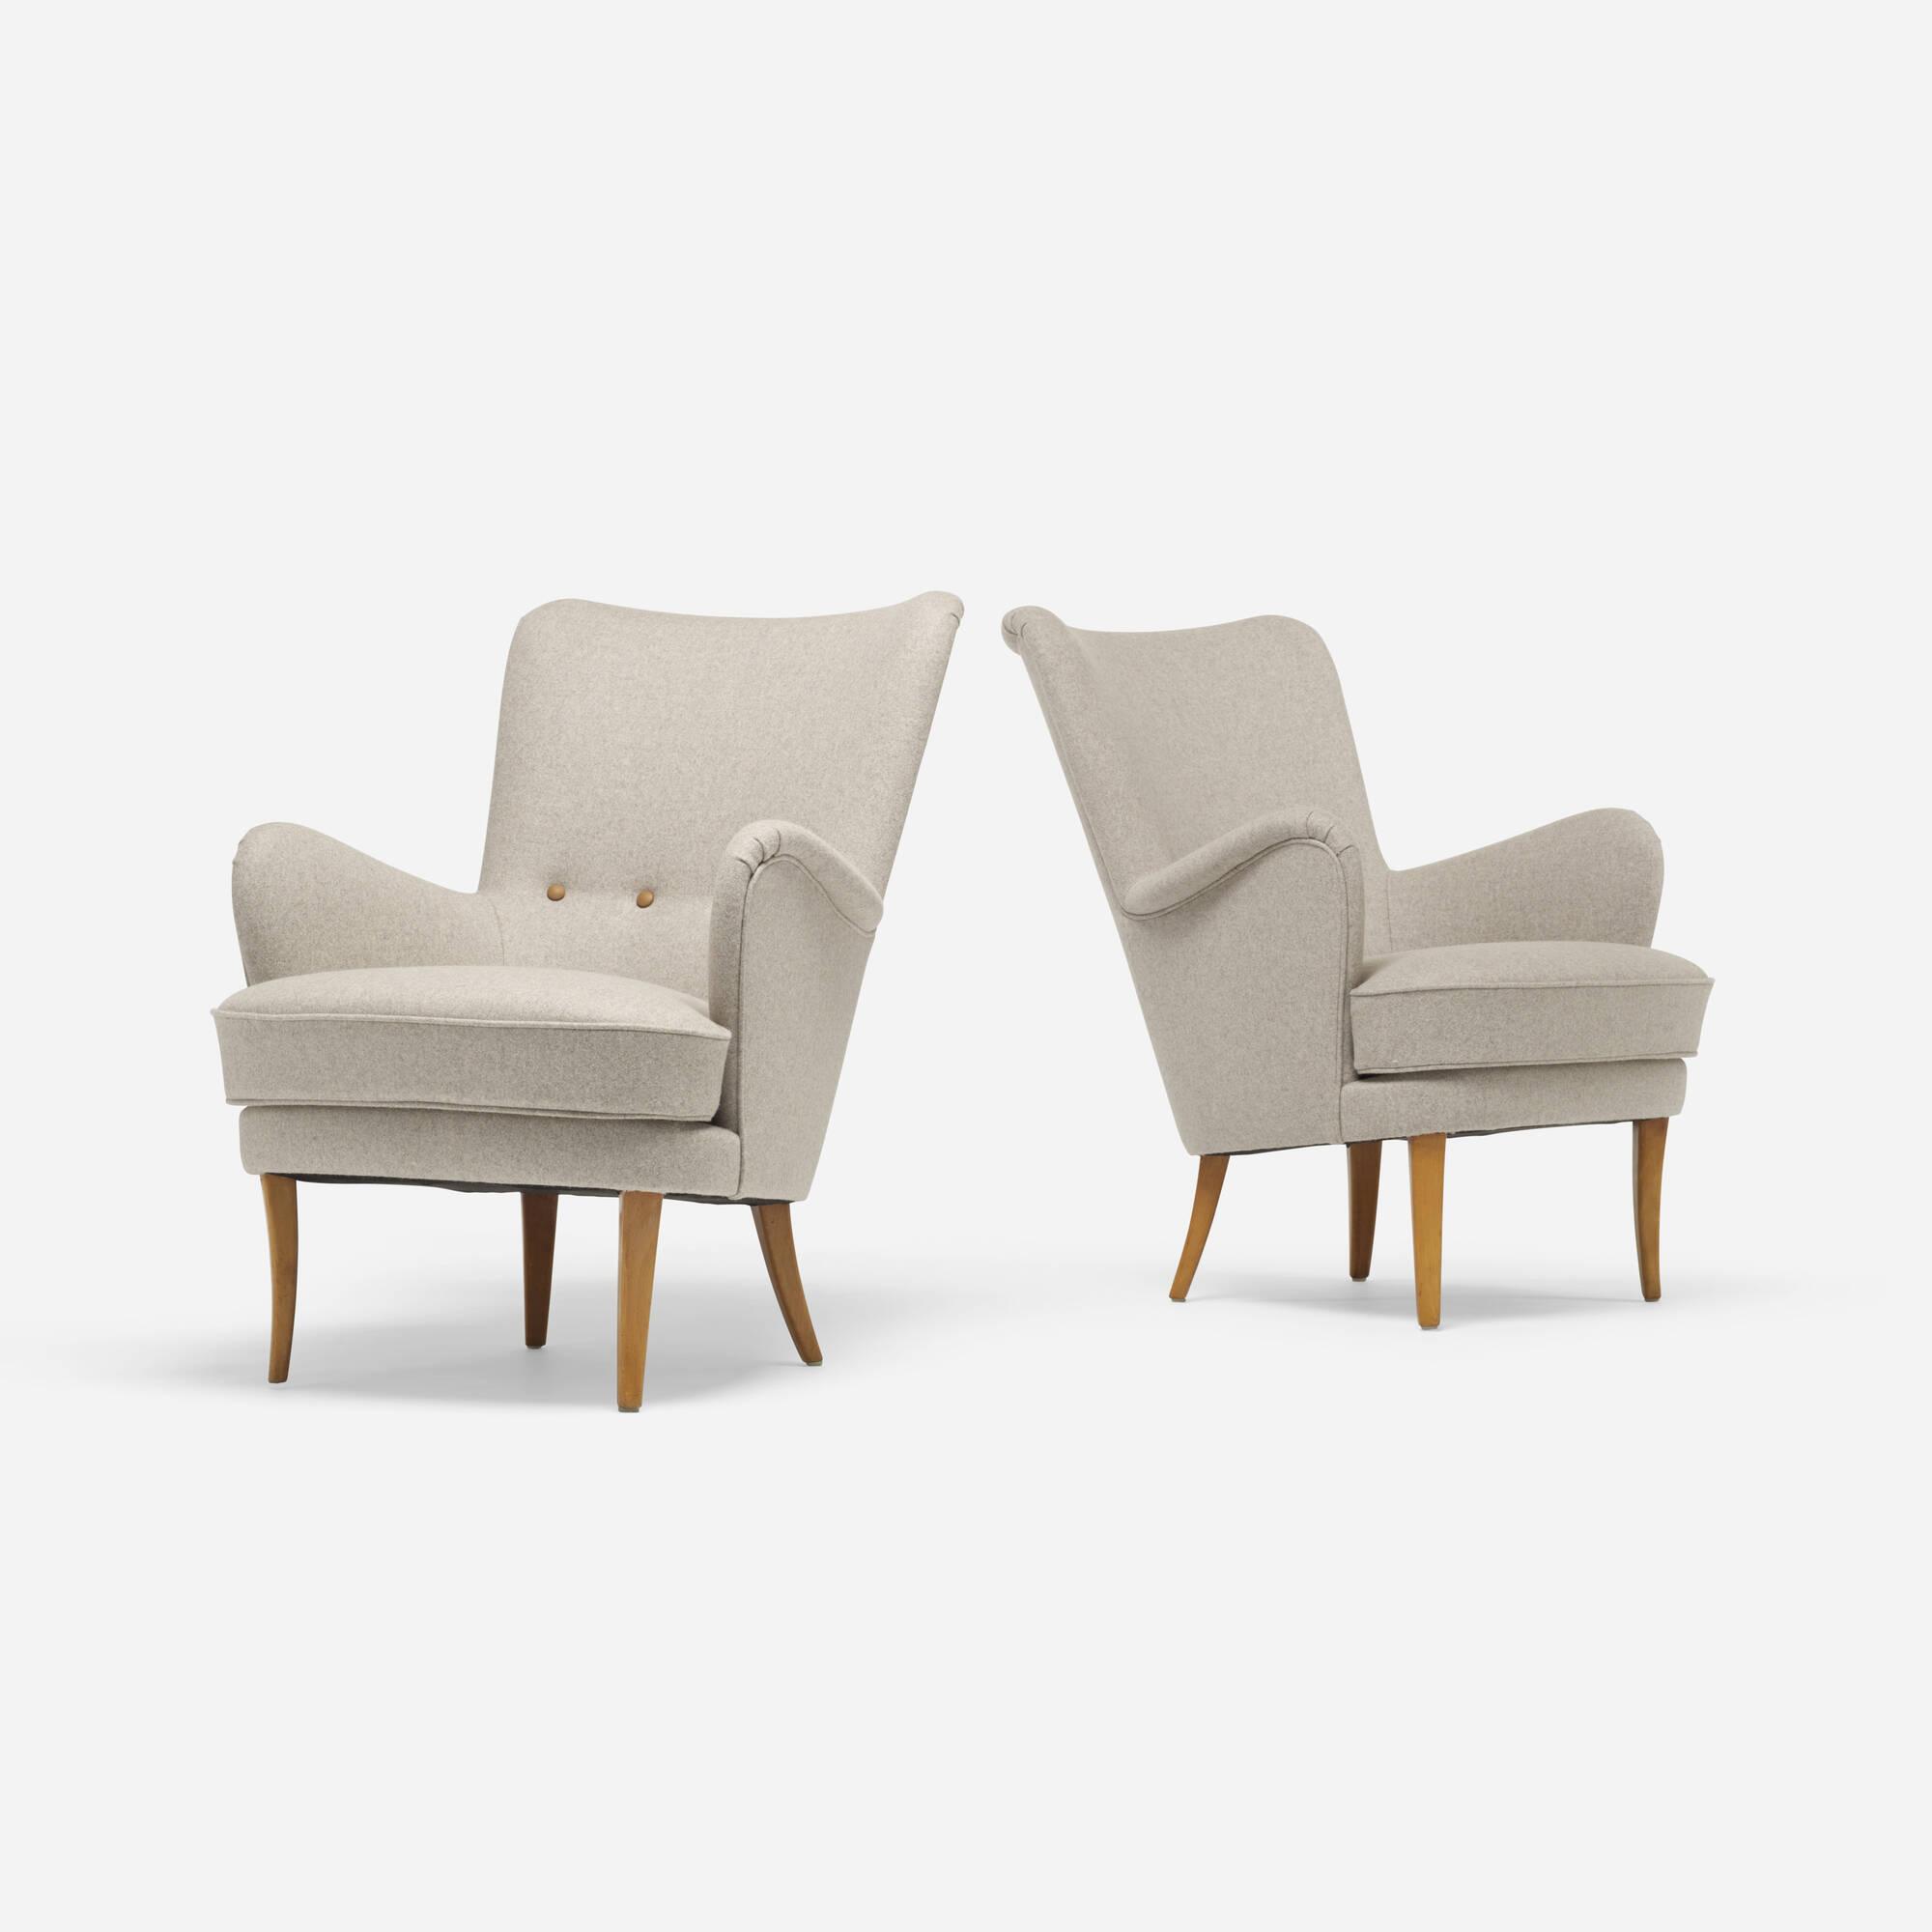 355: Swedish / Lounge Chairs, Pair (1 Of 3)